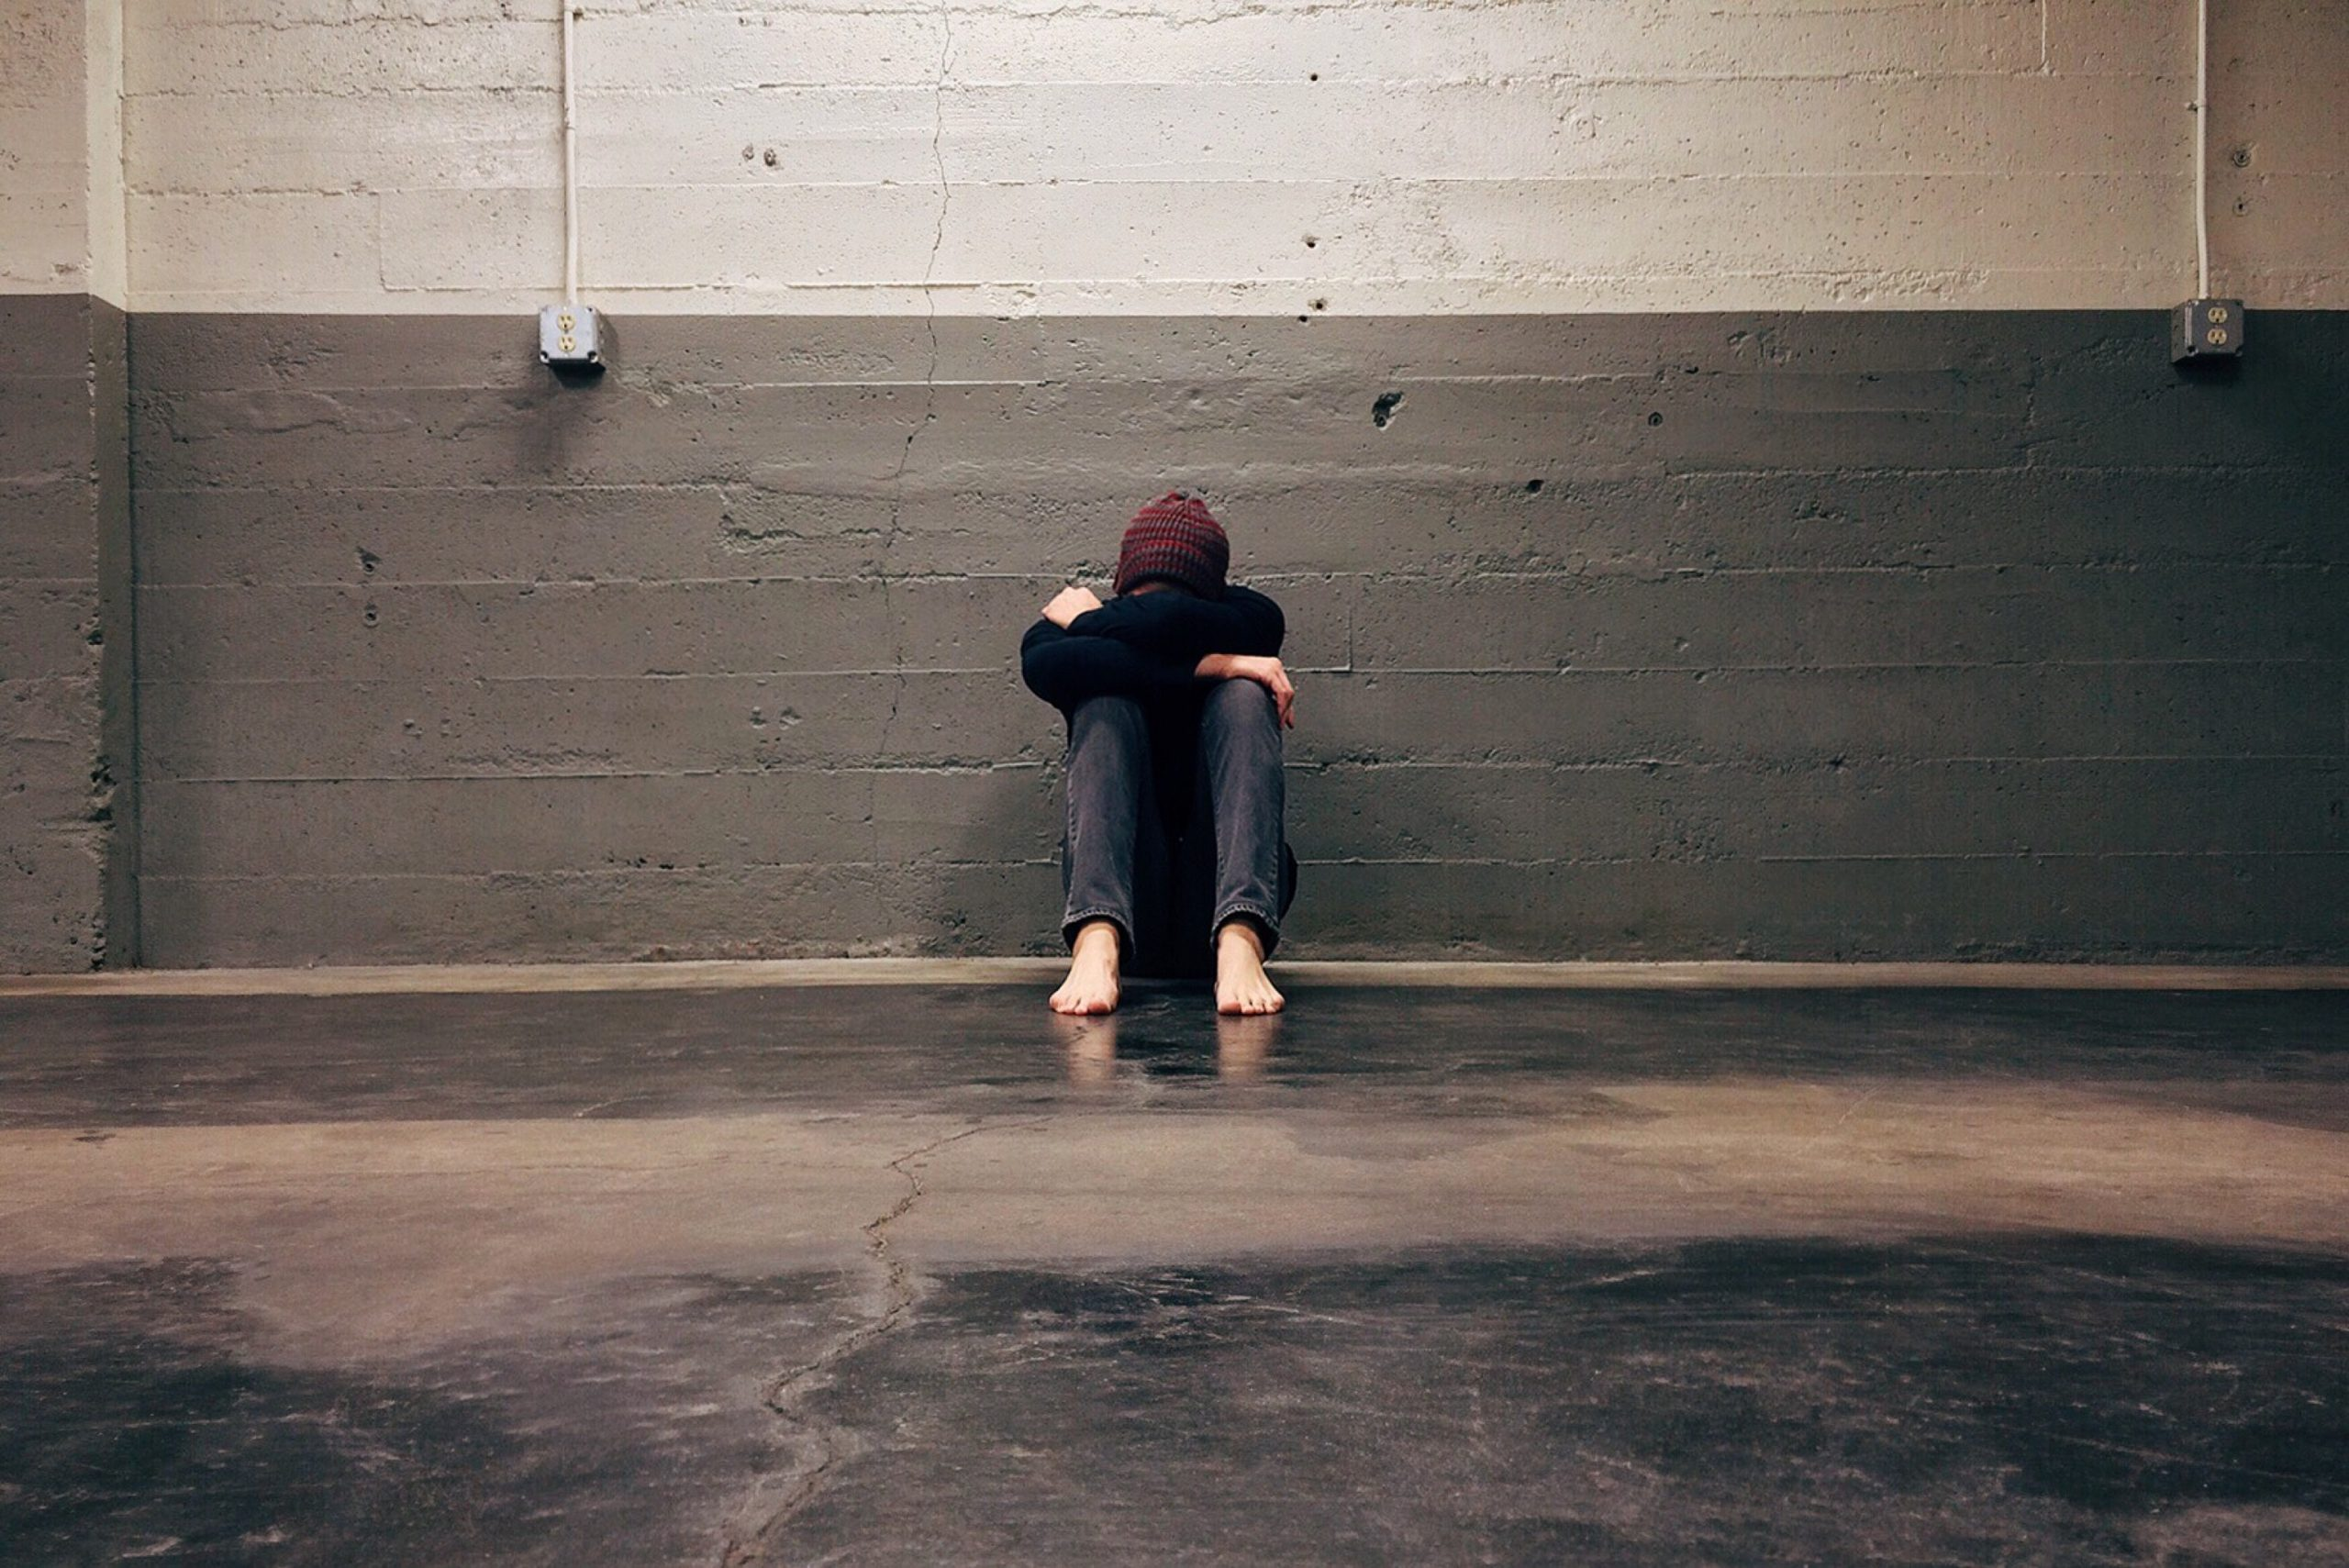 katathlipsi - man - depression